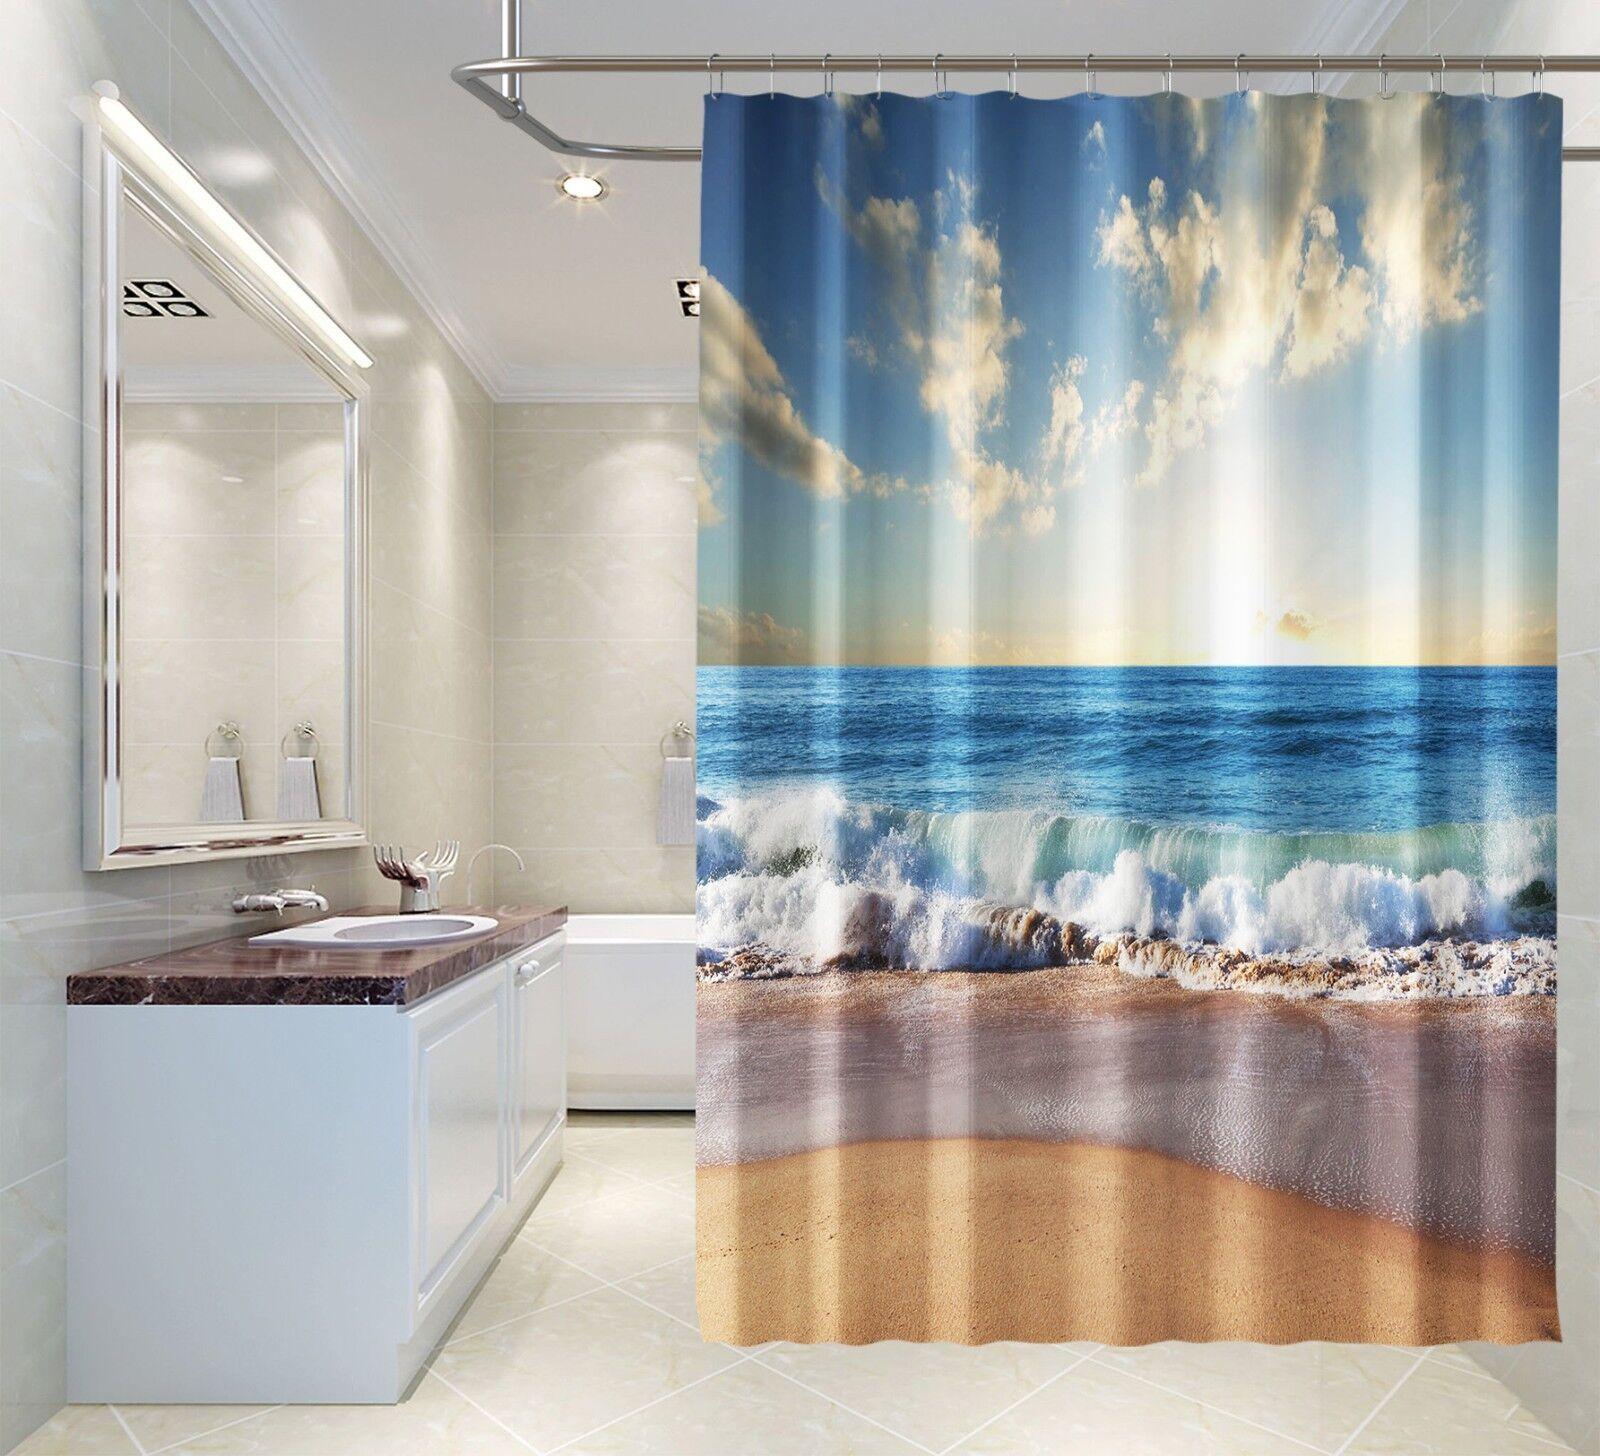 3D Sunset plage 263 Shower Curtain imperméable Fiber Bathroom Home Windows Toilet